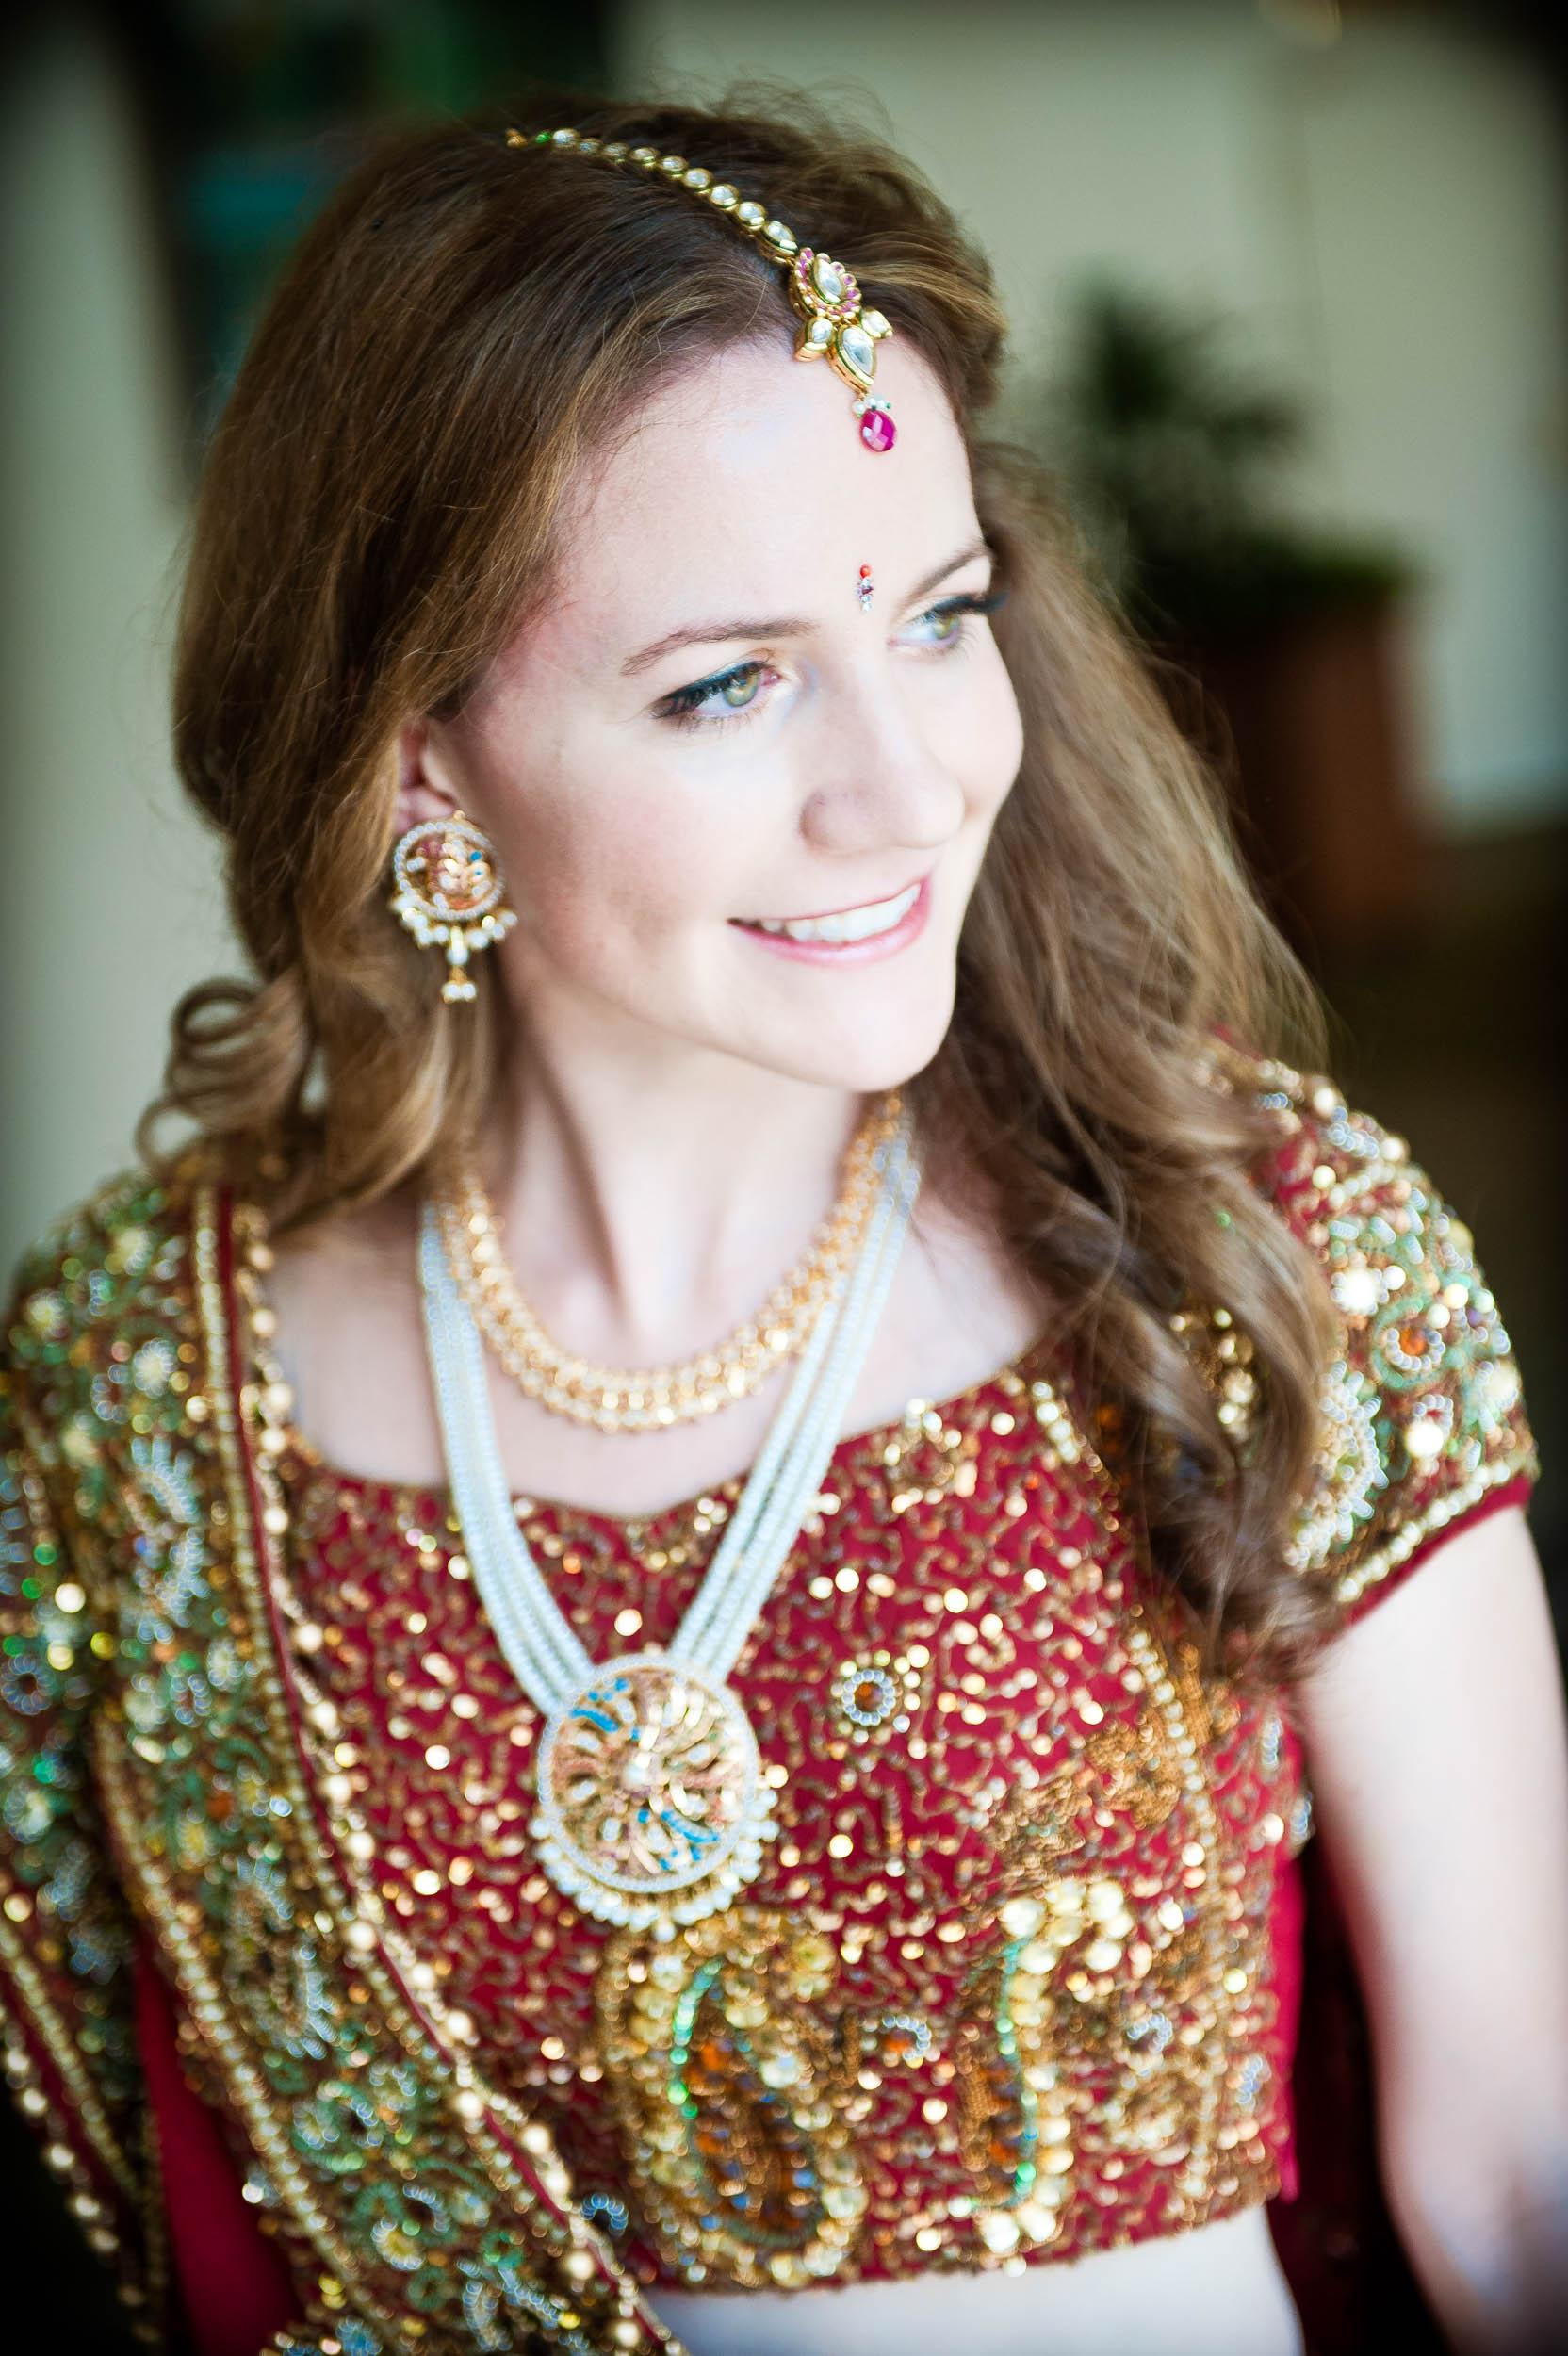 Wedding13Bride_Indian_wedding_full_dress-2.jpg